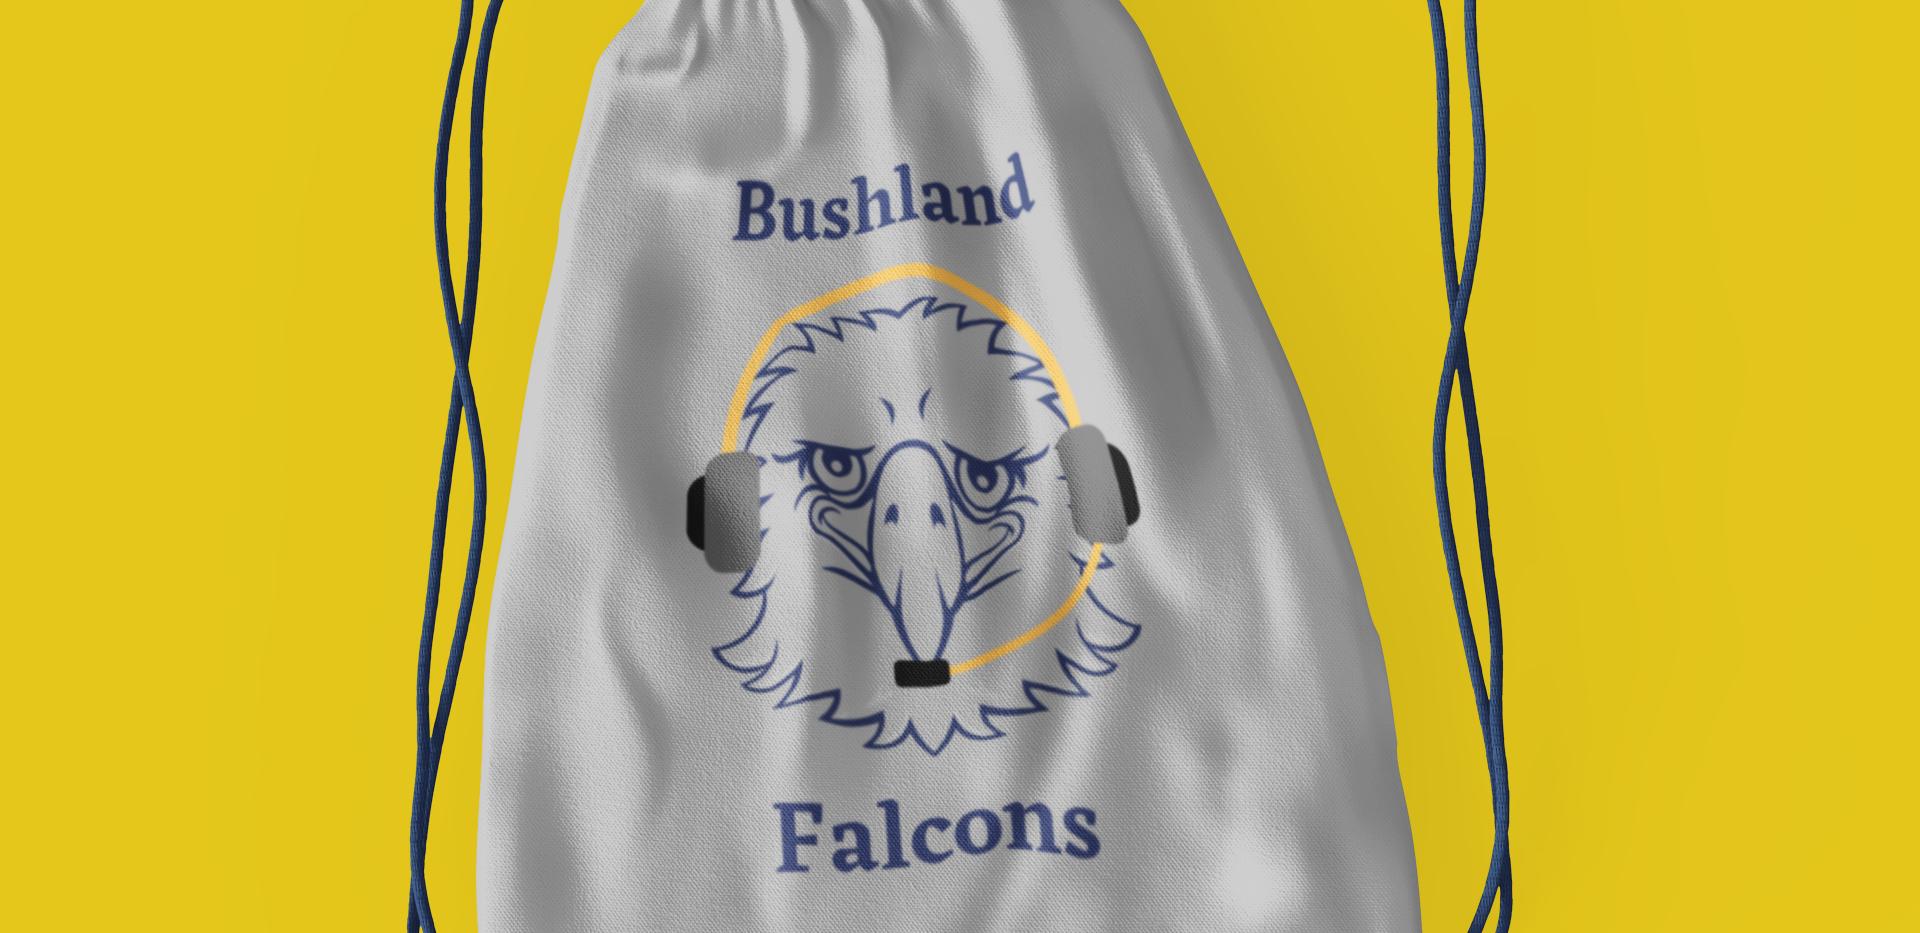 Bushland Falcons Bag